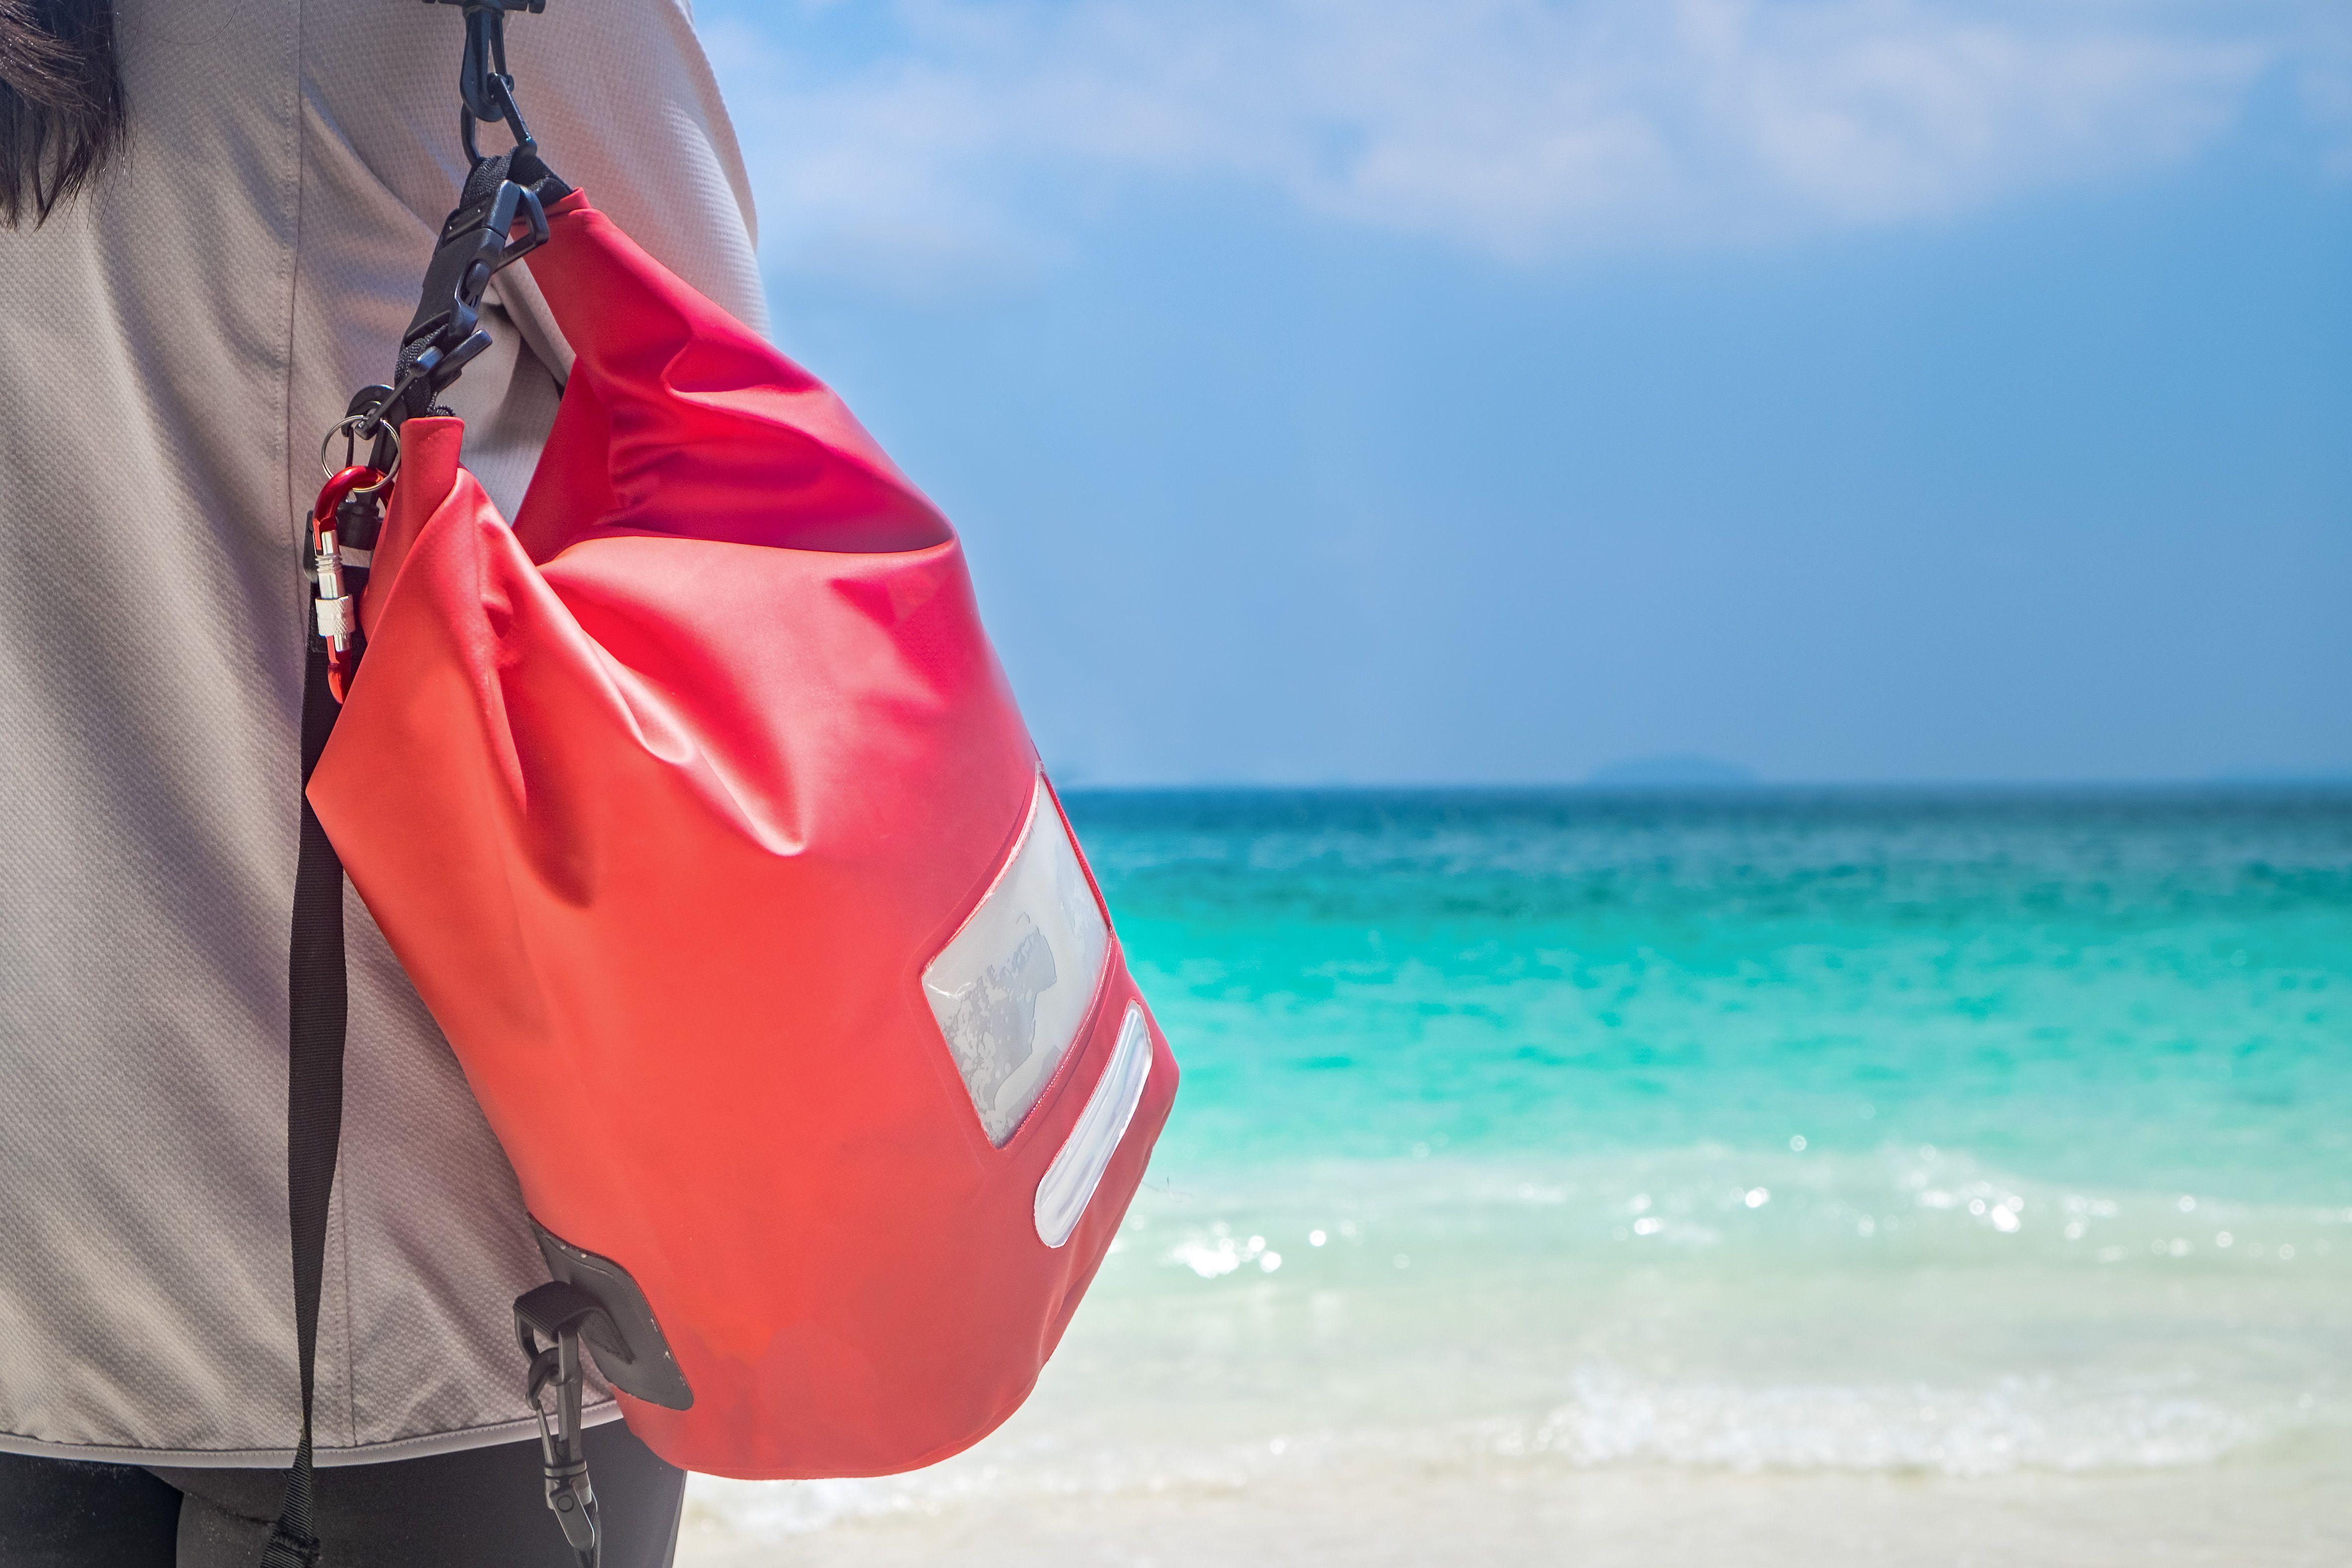 Woman Hang Dry Pack(Waterproof Luggage) on the Beach